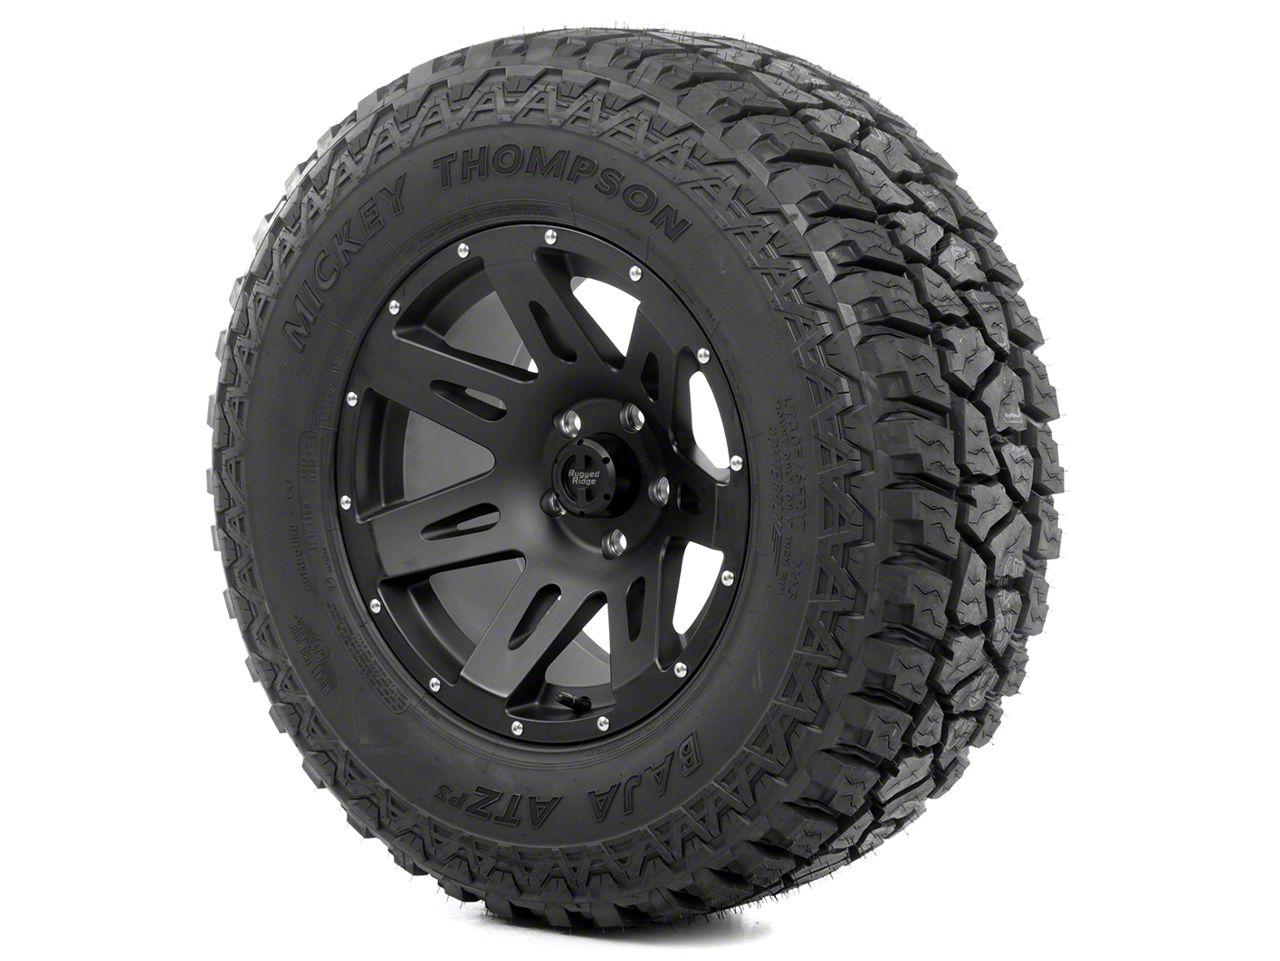 Rugged Ridge XHD Wheel 17x9 Black Satin and Mickey Thompson ATZ P3 305/65R17 Tire Kit (07-18 Jeep Wrangler JK)